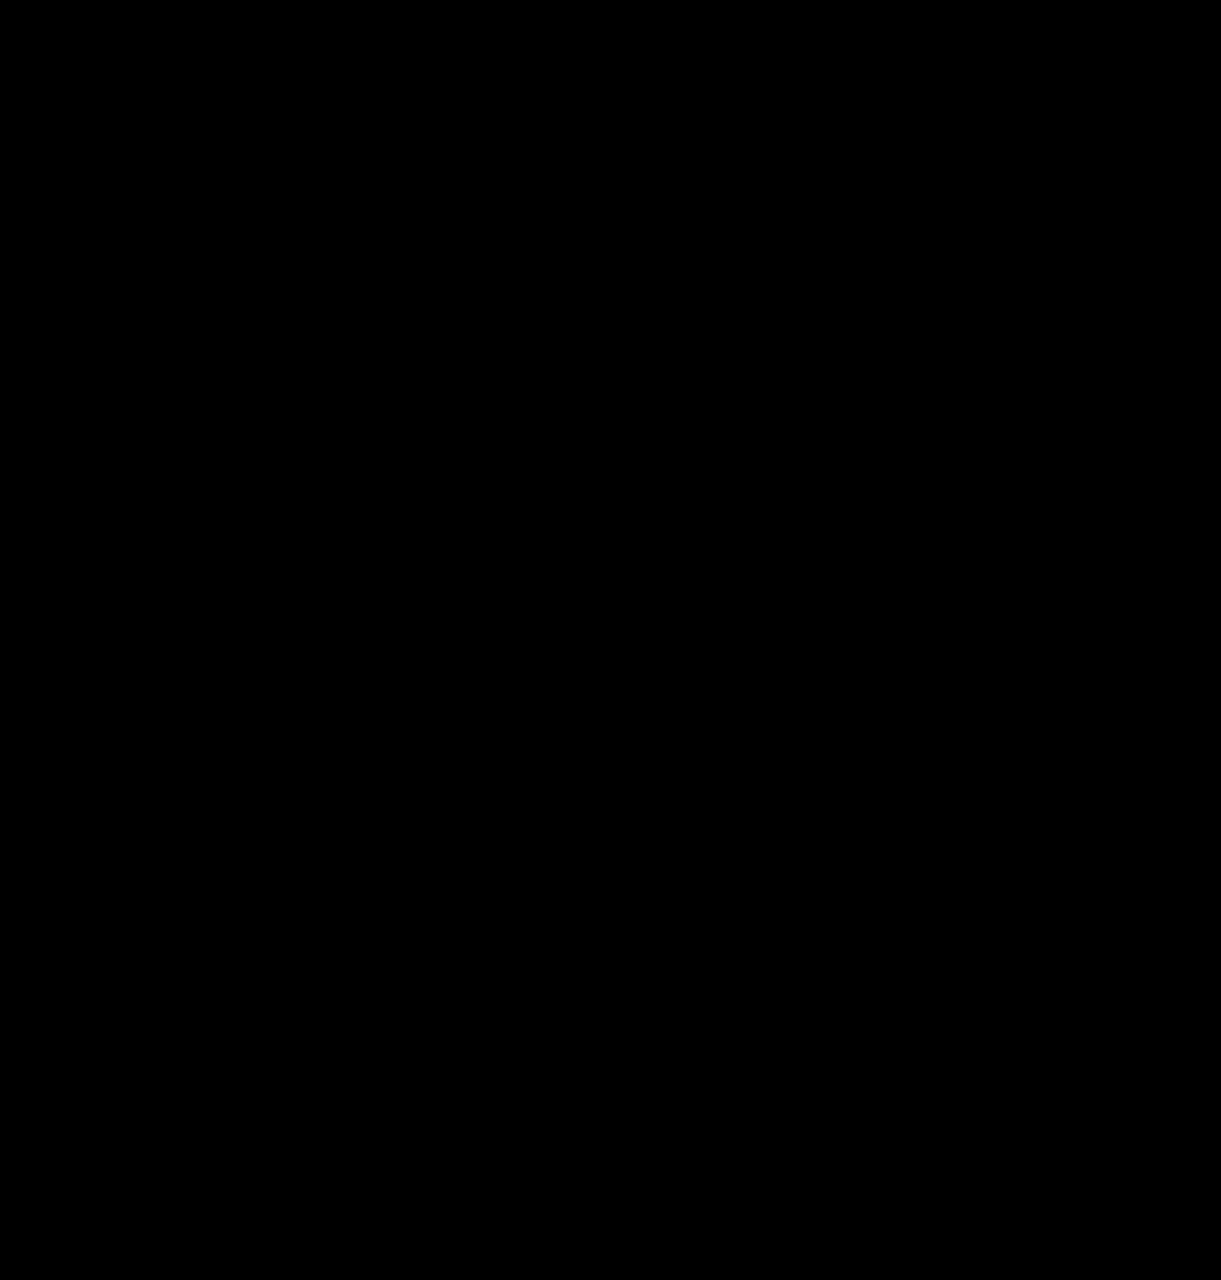 18052001